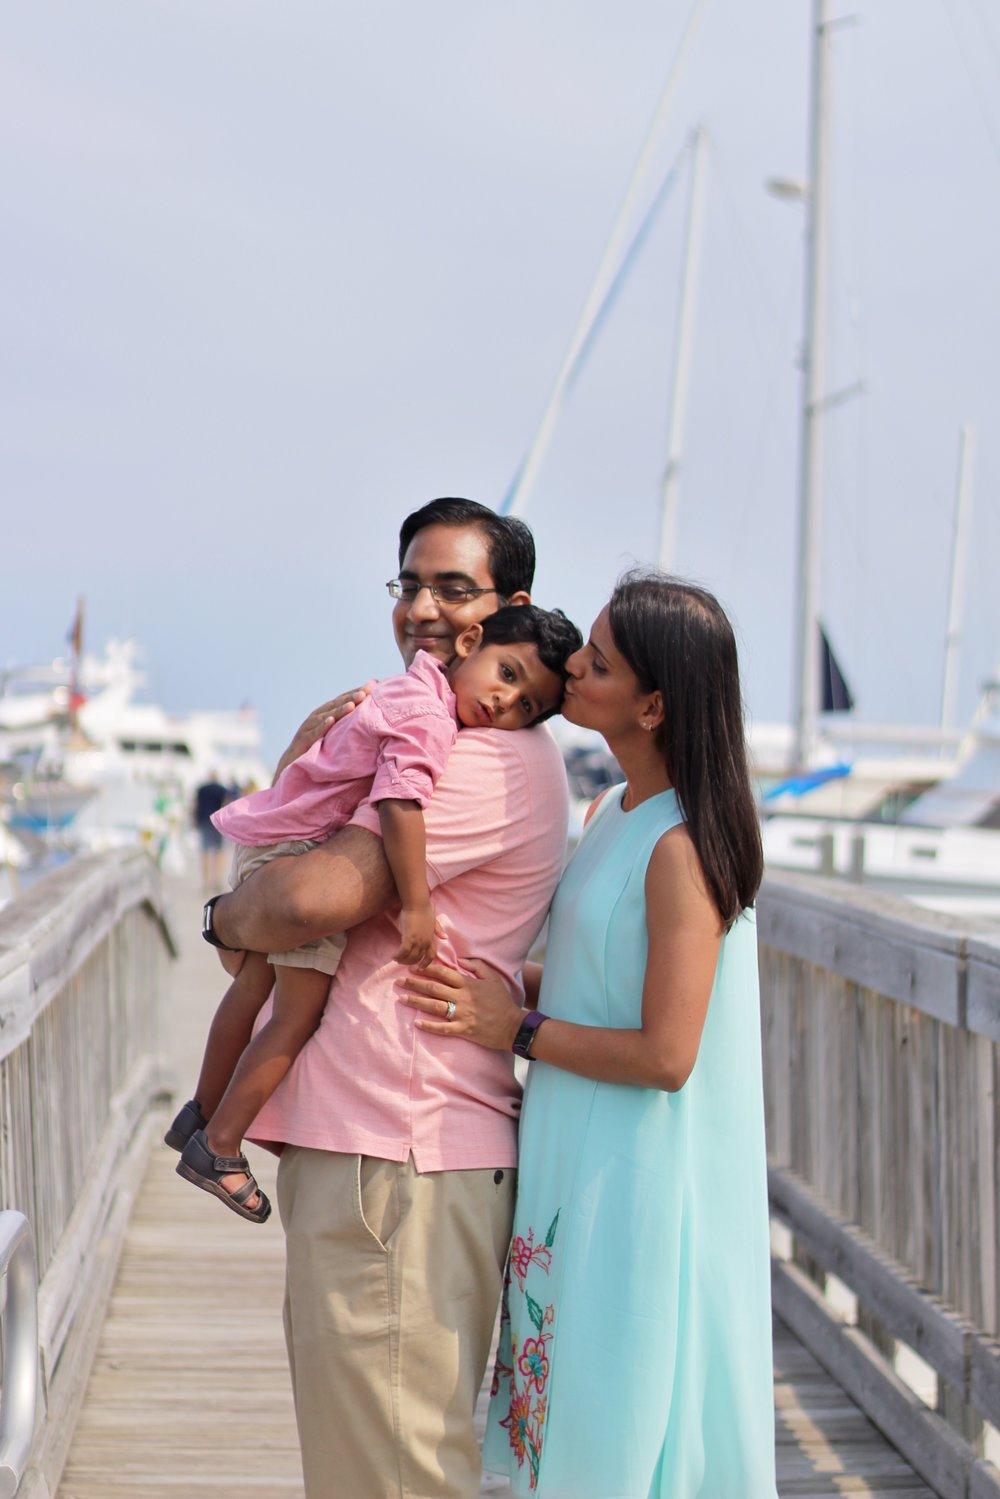 Patel Family Traverse City August 2018 (51).JPG